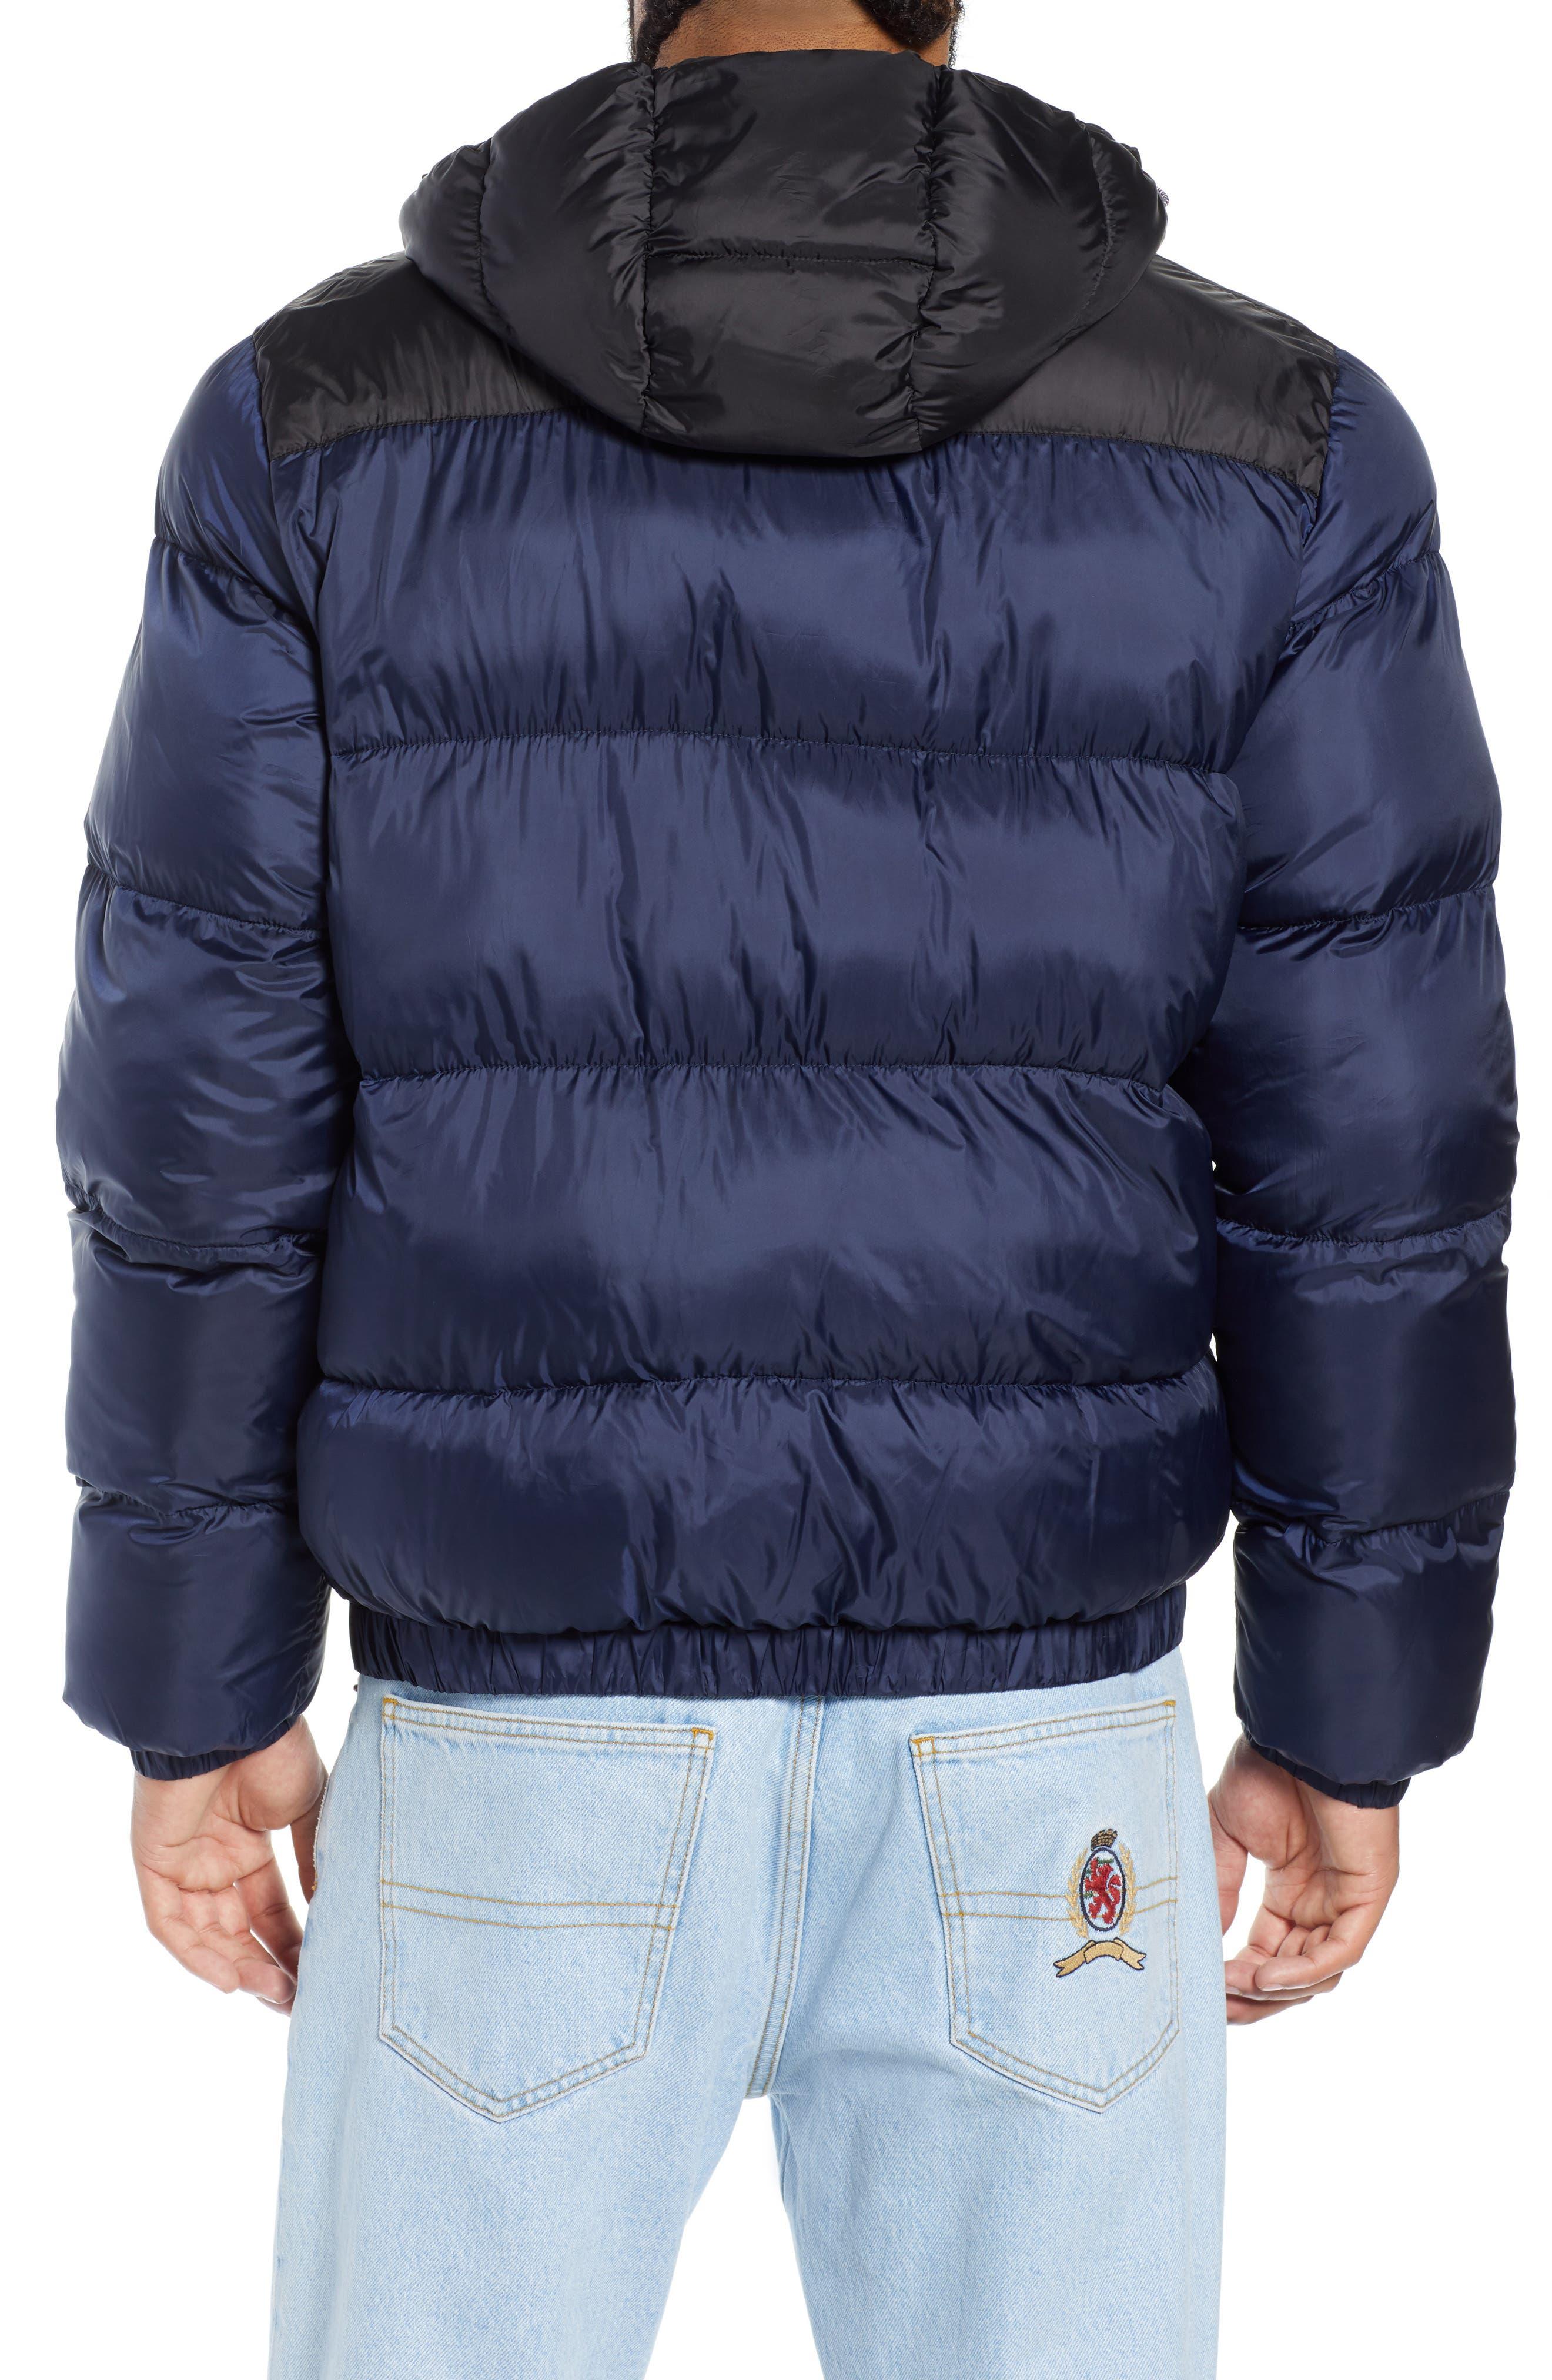 Classics Hooded Jacket,                             Alternate thumbnail 2, color,                             BLACK IRIS / TOMMY BLACK